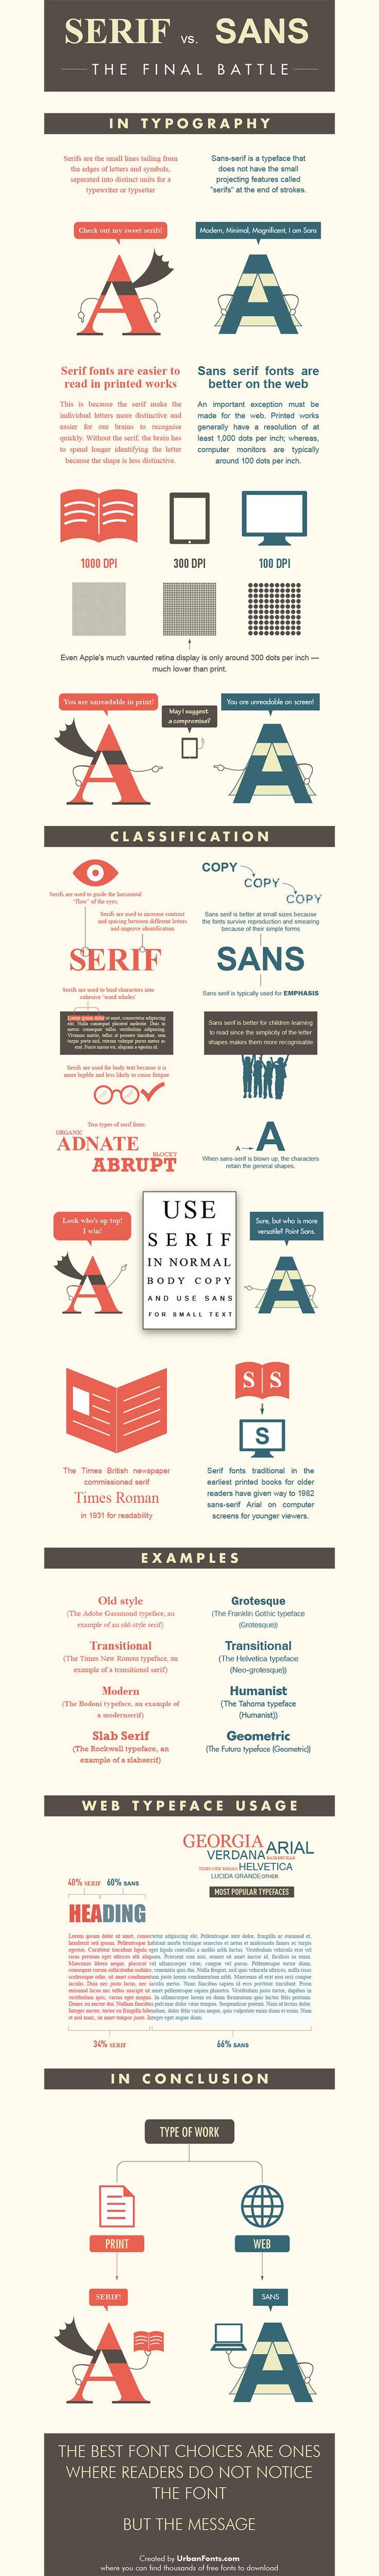 Serif vs. Sans via Web Designer Depot